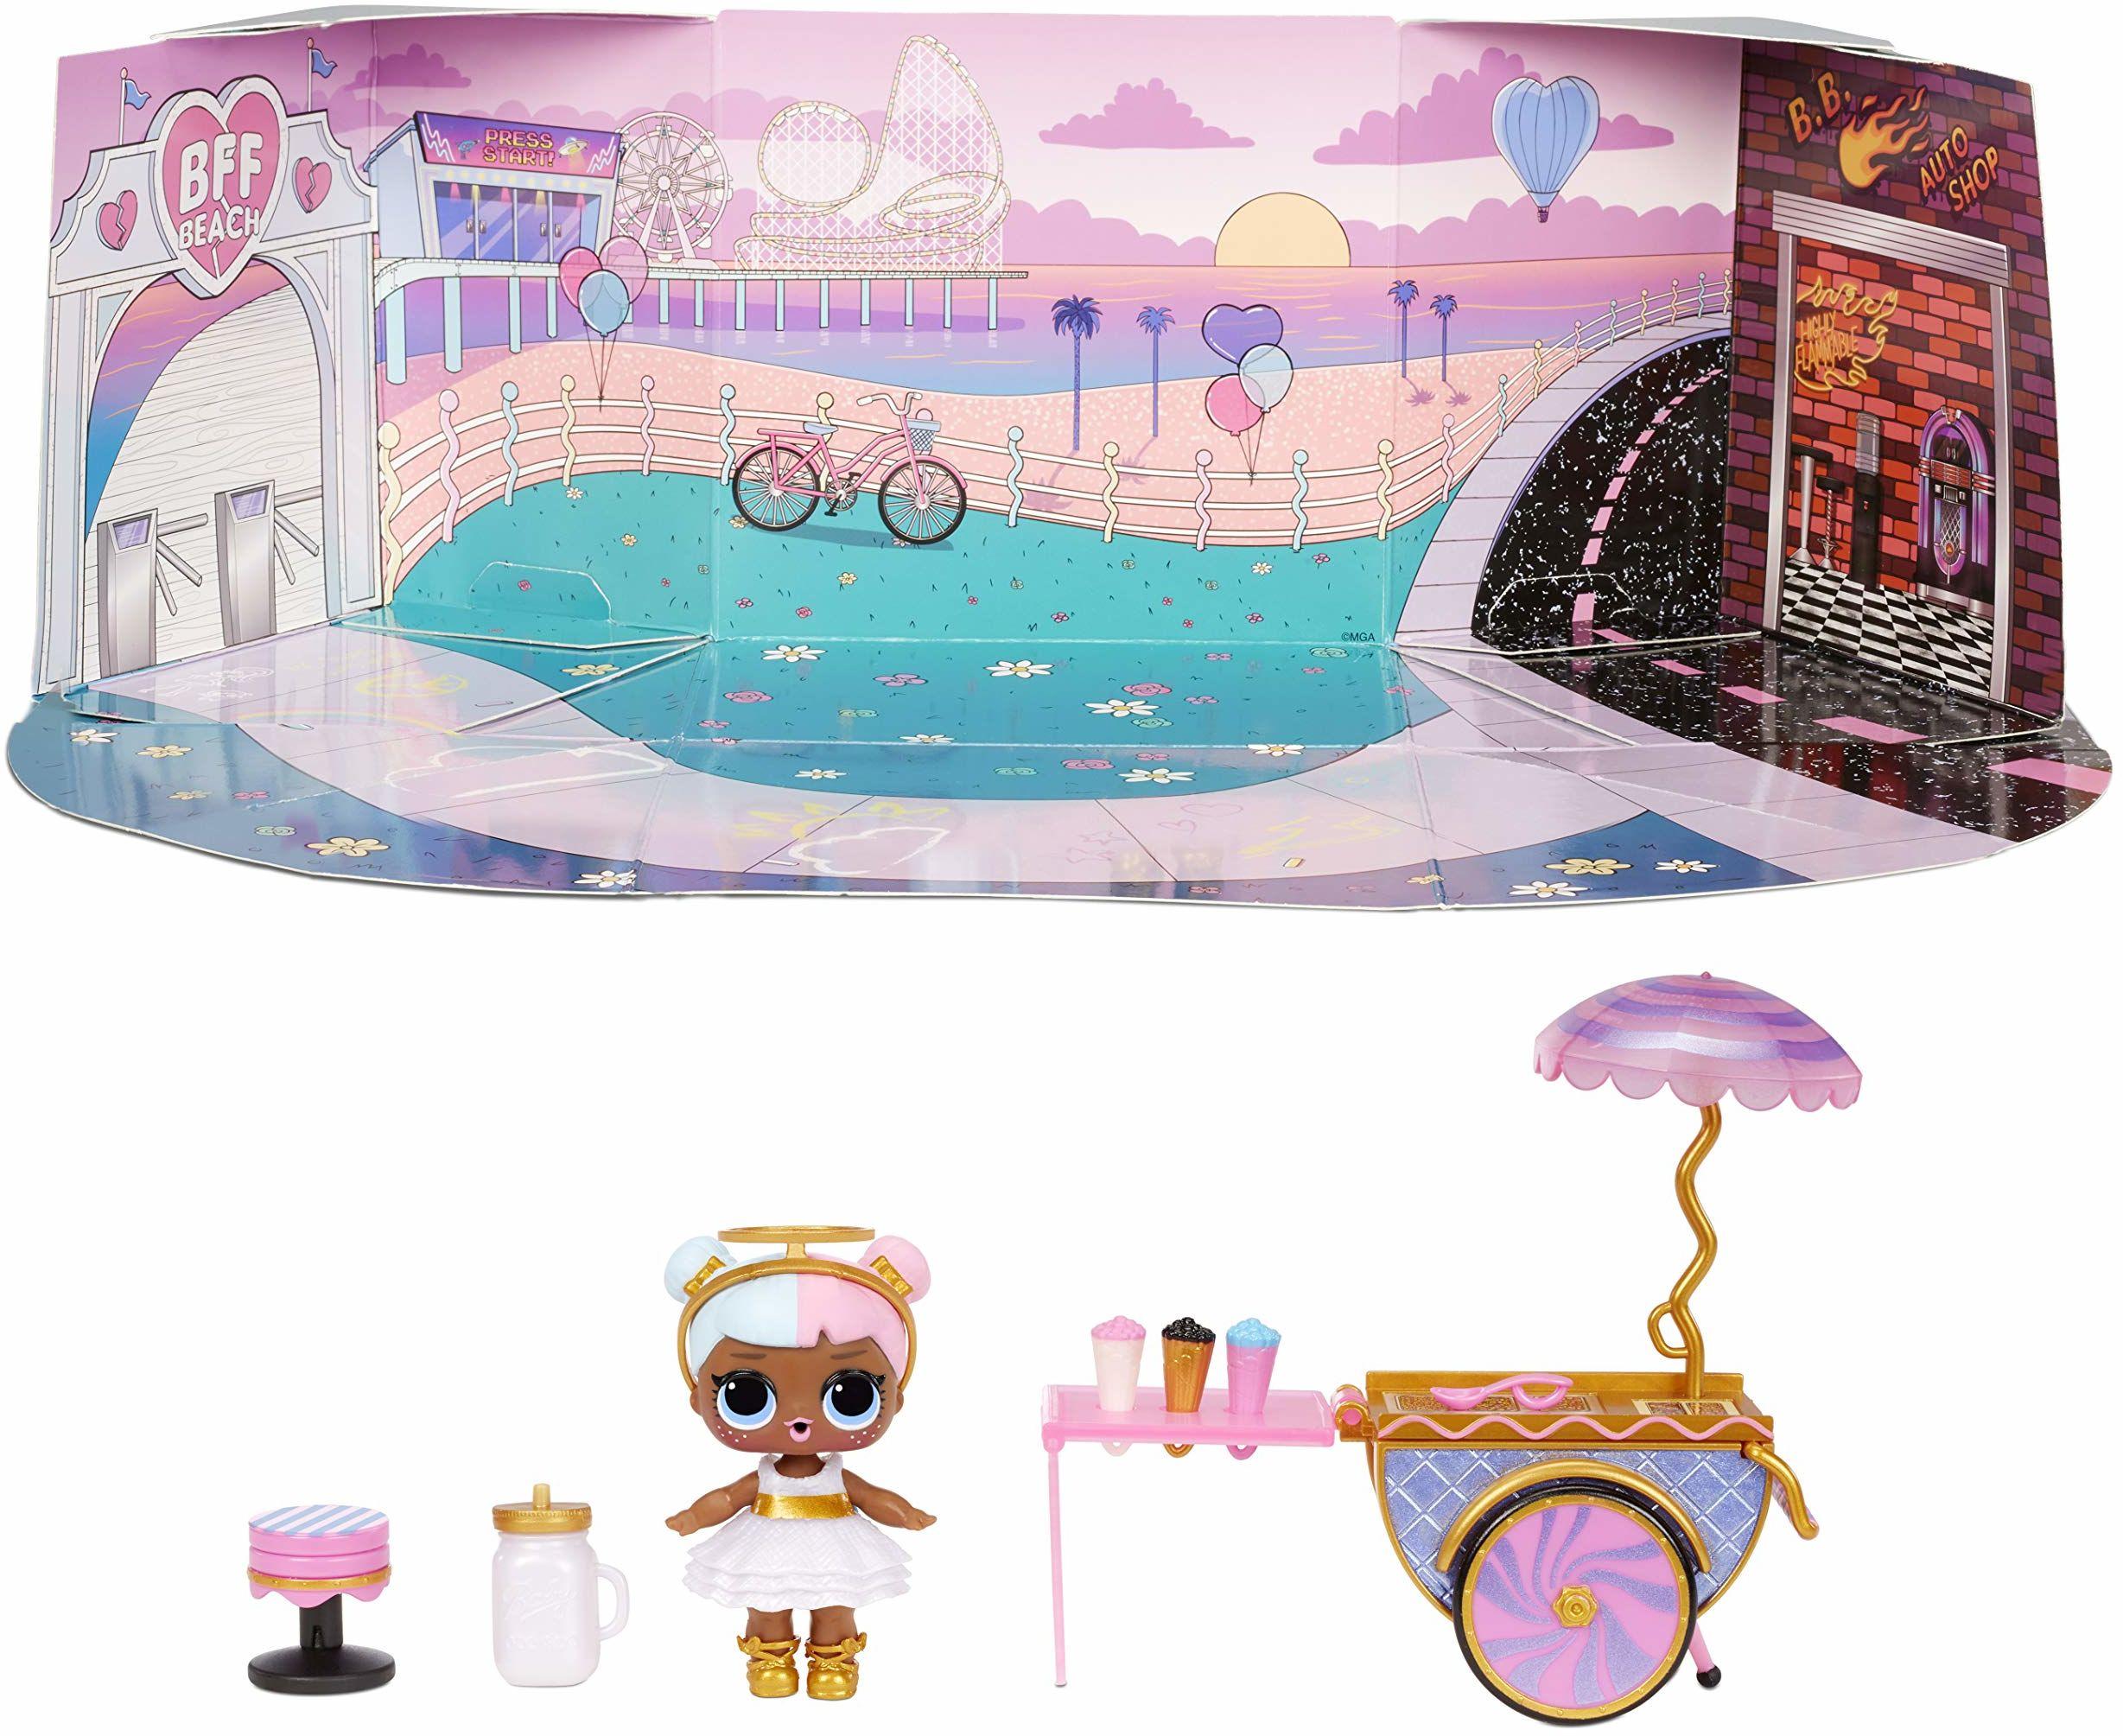 L.O.L. Surprise! 572626EUC LOL Sweet Boardwalk z cukrem ponad 10 niespodzianek, zestaw mebli dla lalek wózek na cukierki, akcesoria